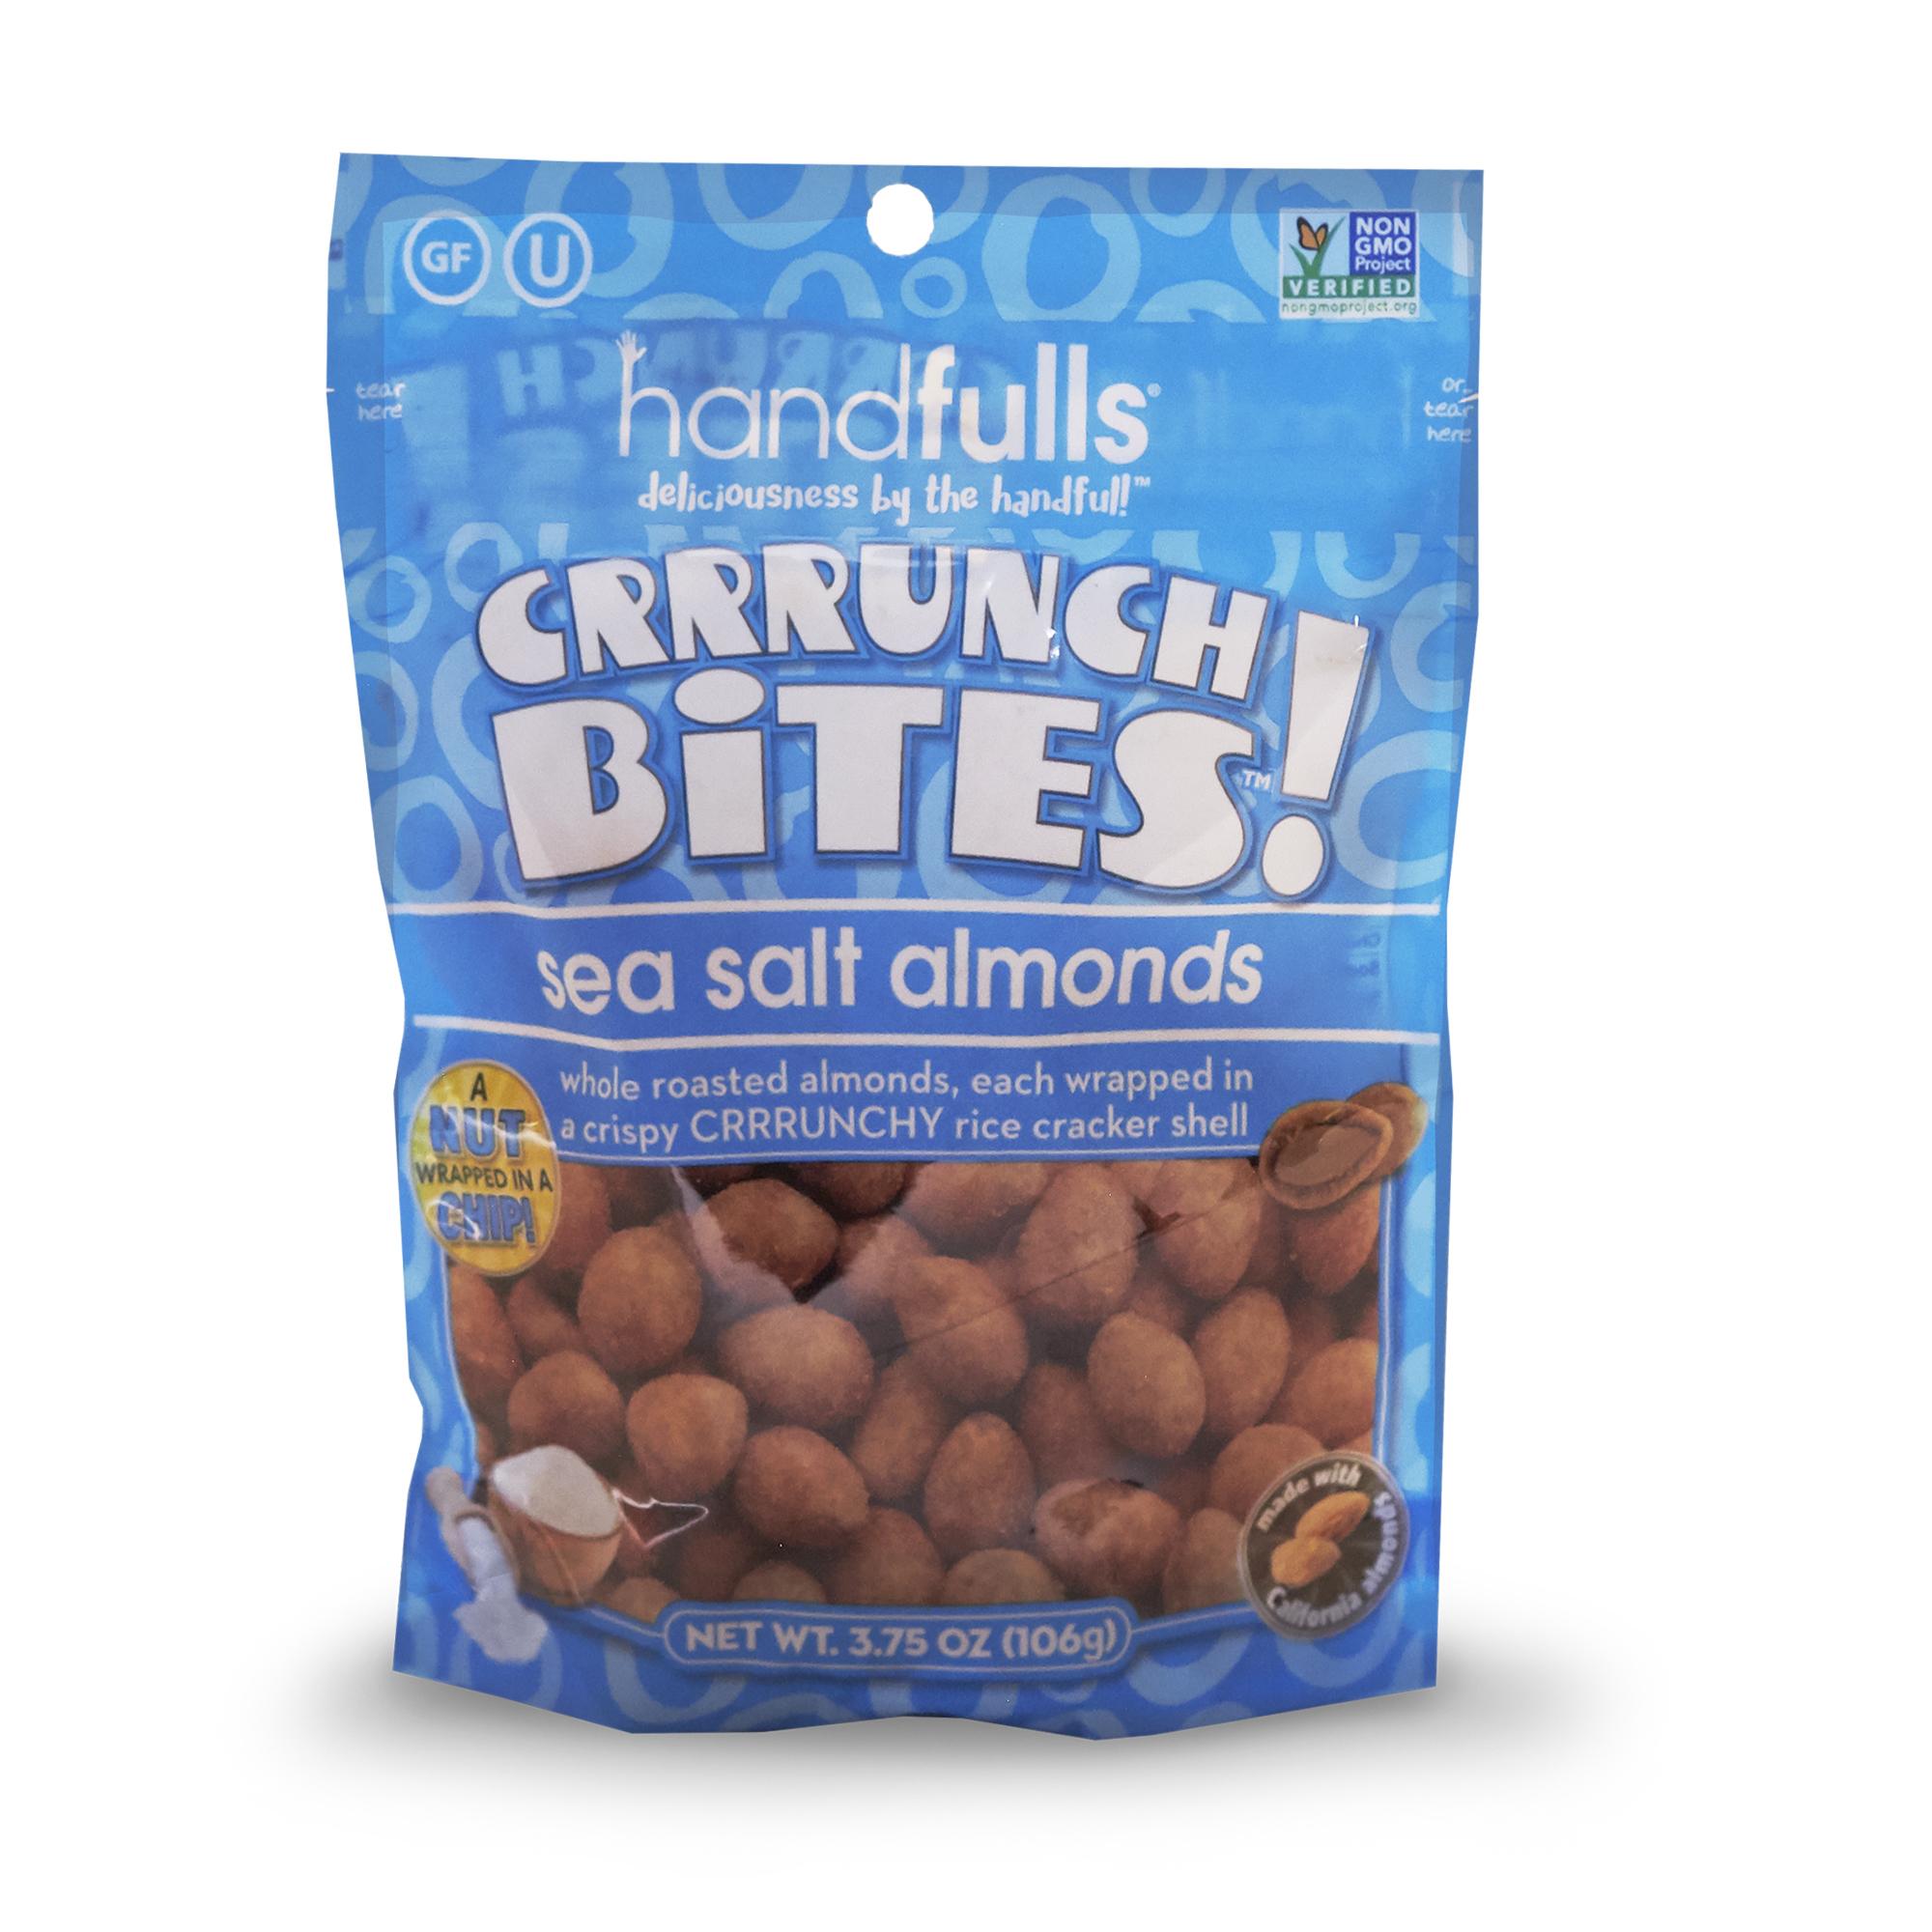 Handfulls_CrrrunchBites_Sea_Salt_3.75oz_2000x2000px.jpg